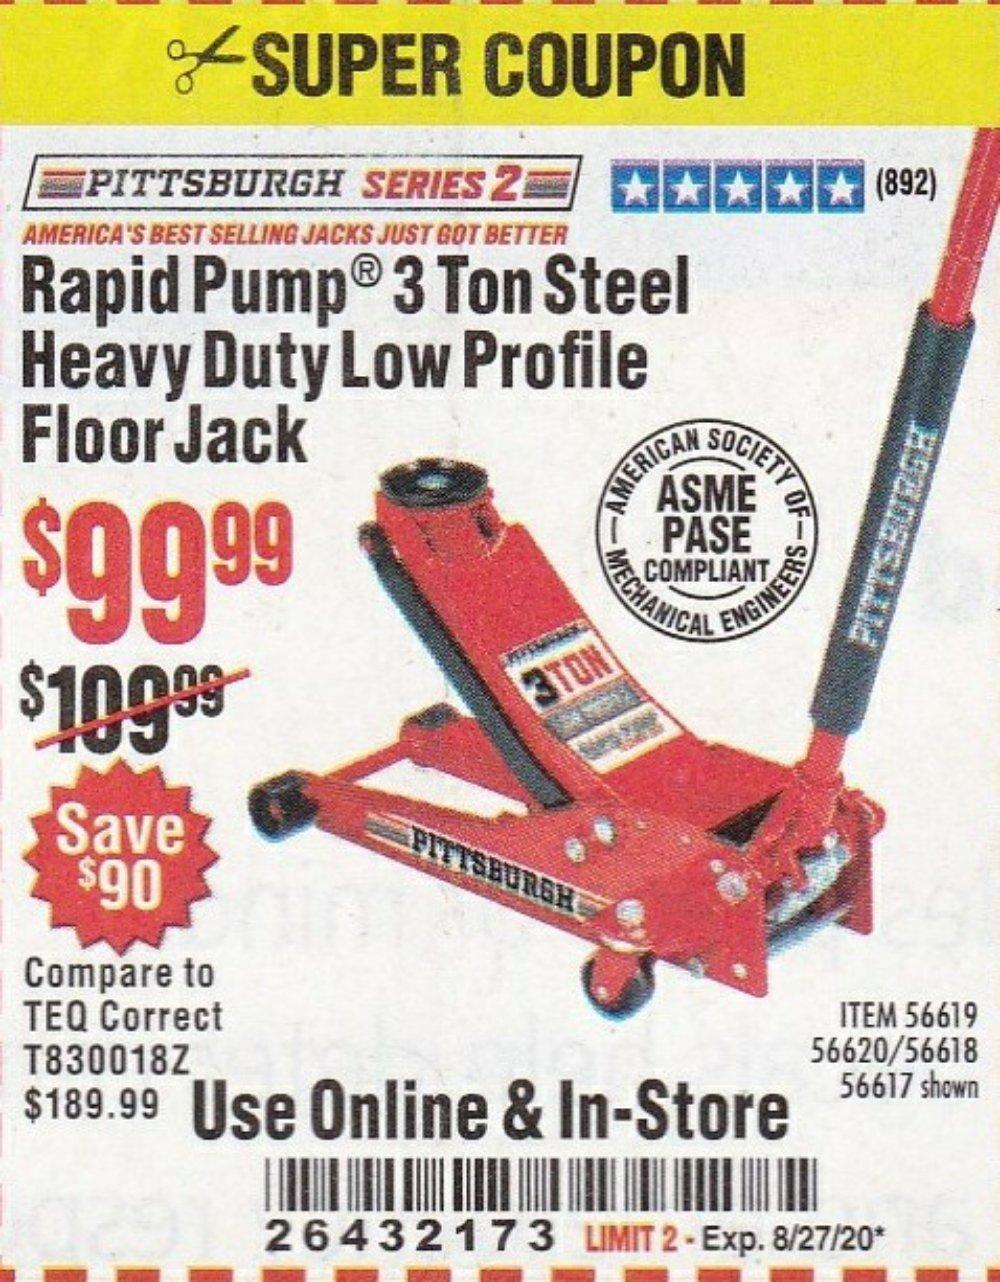 Harbor Freight Coupon, HF Coupons - Rapid Pump 3 Ton Steel Heavy Duty Low Profile Floor Jack